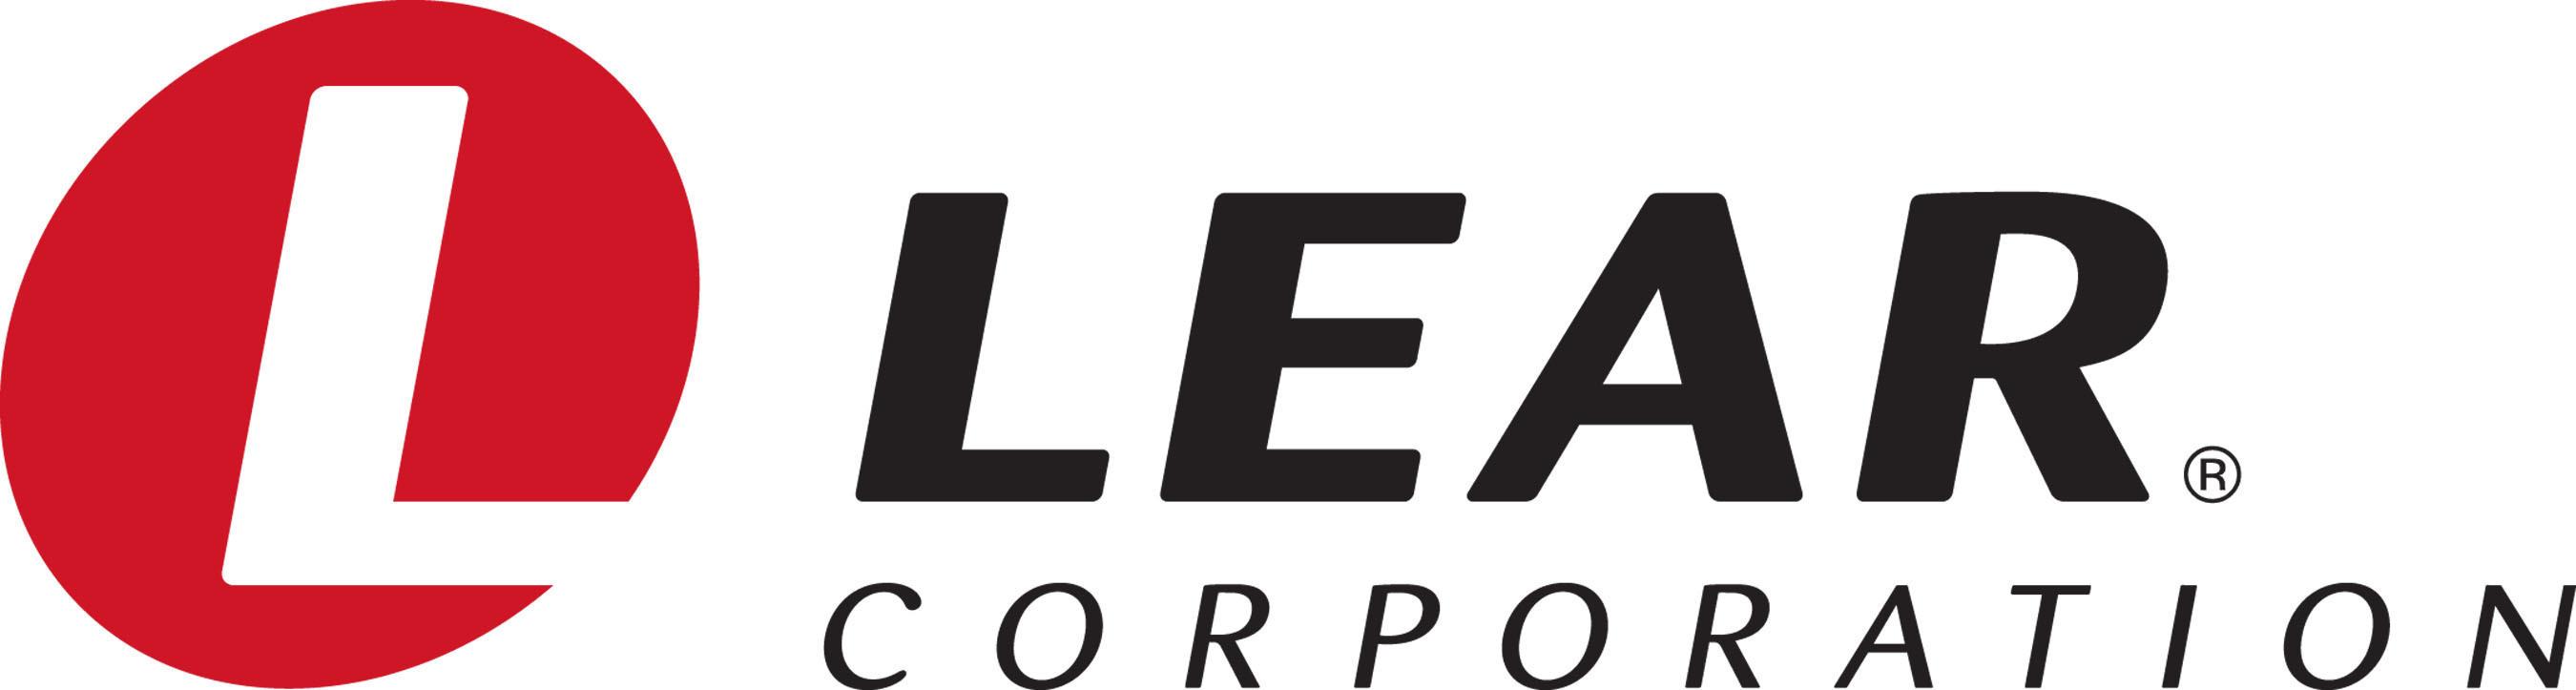 Lear Corporation Logo.